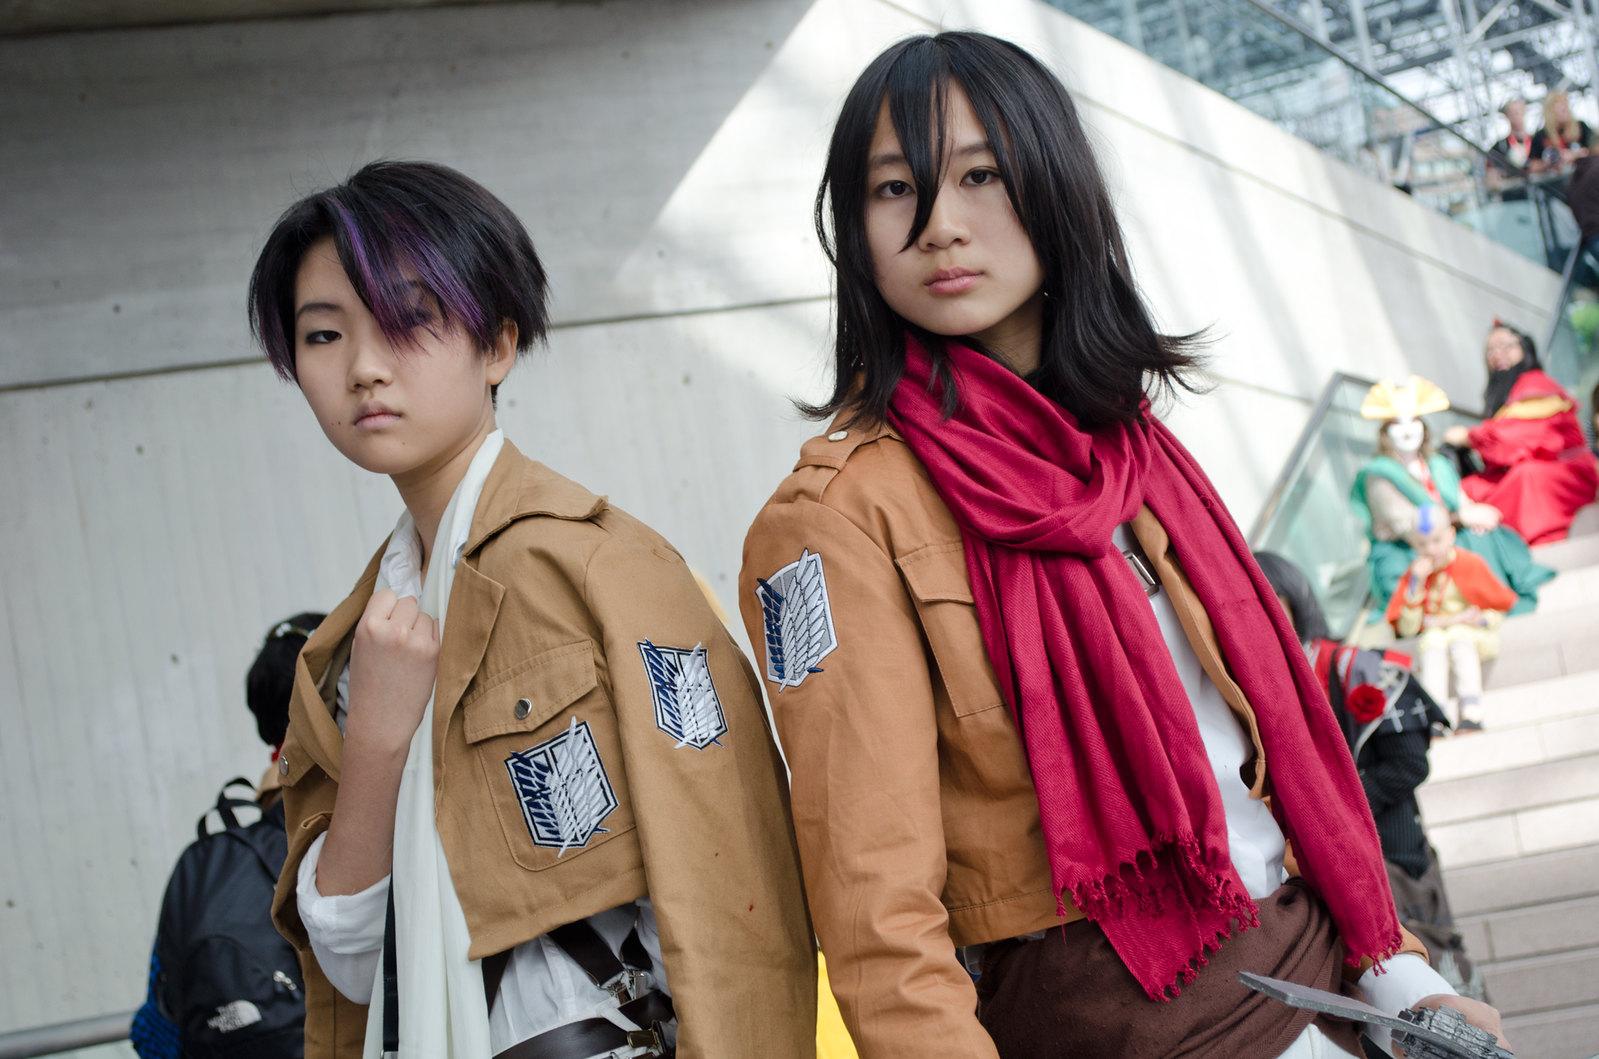 NYCC Mikasa & Levi Cosplay